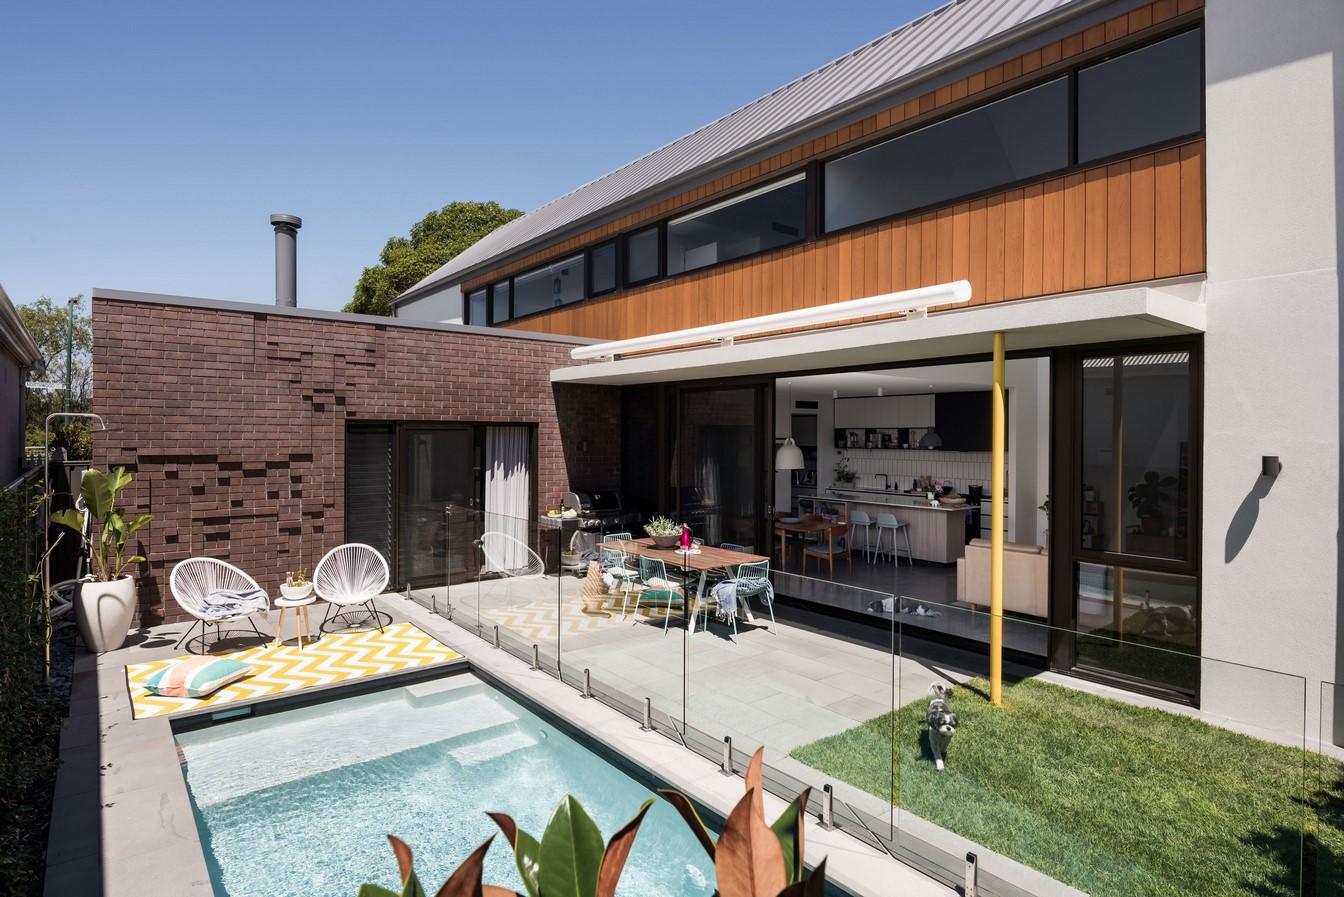 Northwood Street Residence - Sheet2